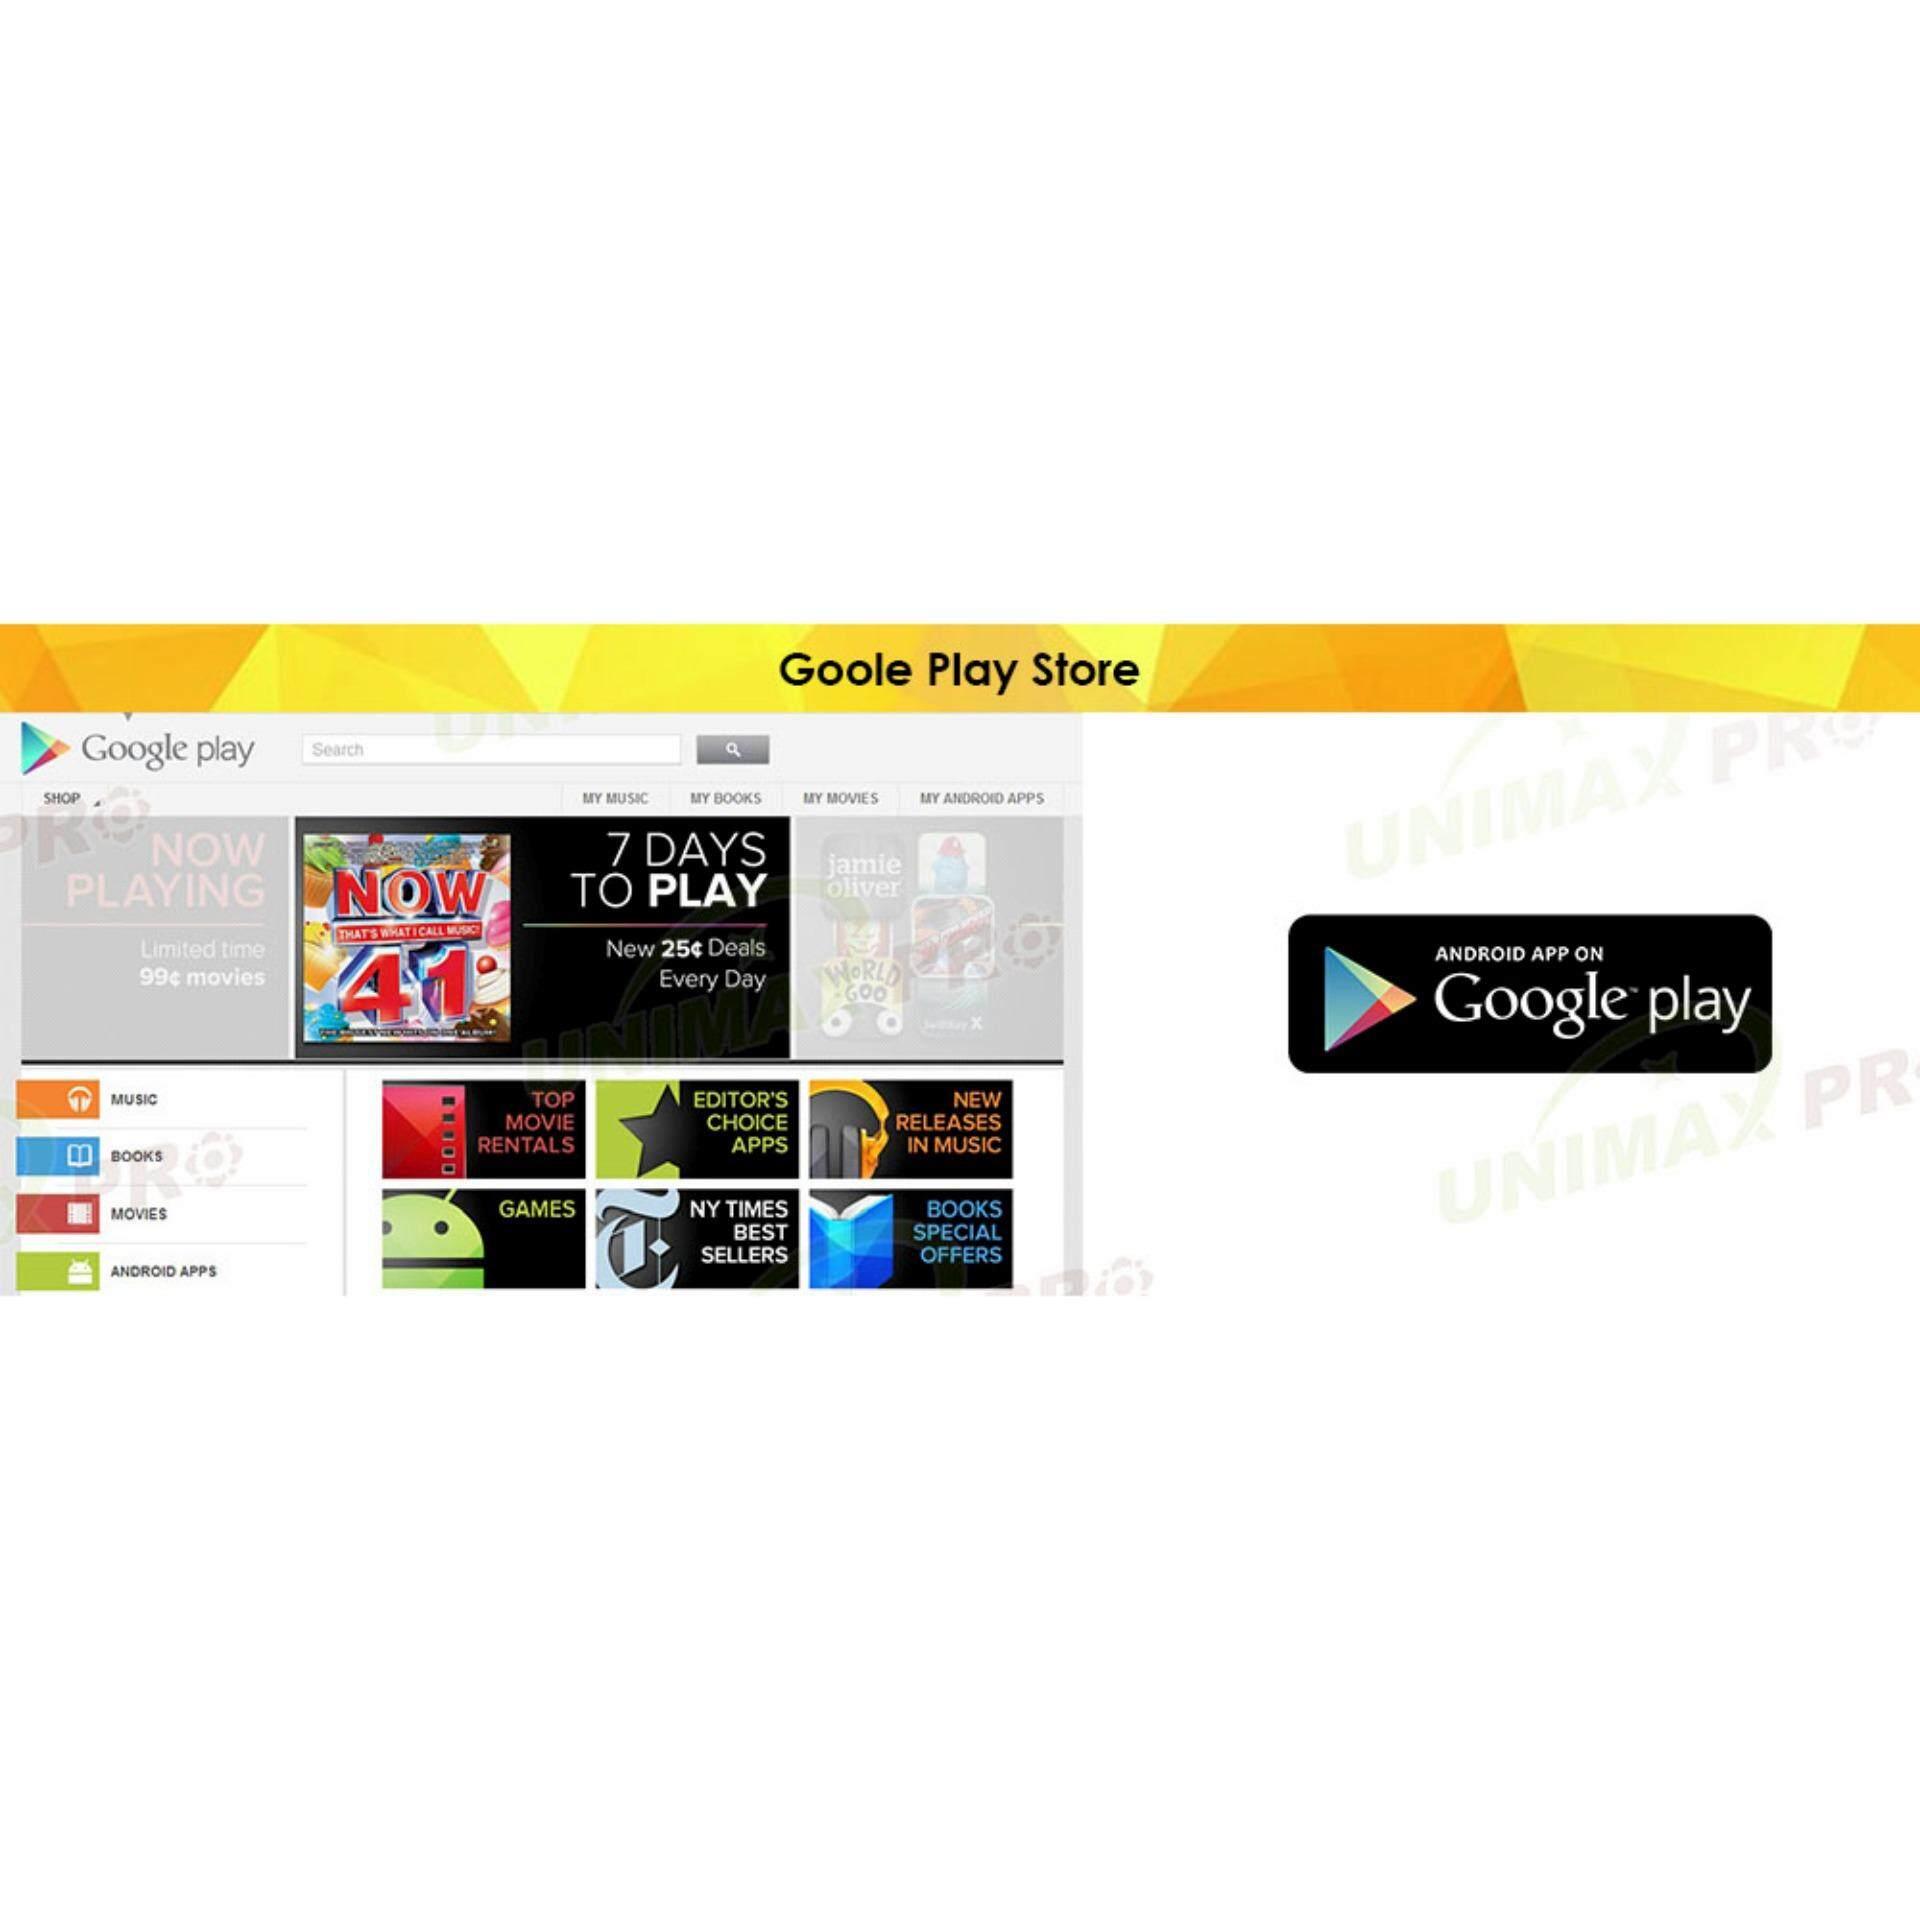 MXQ PRO 4K WATCH 10000++ DRAMA / MOVIE Quad Core 1GB / 8GB Android TV Box